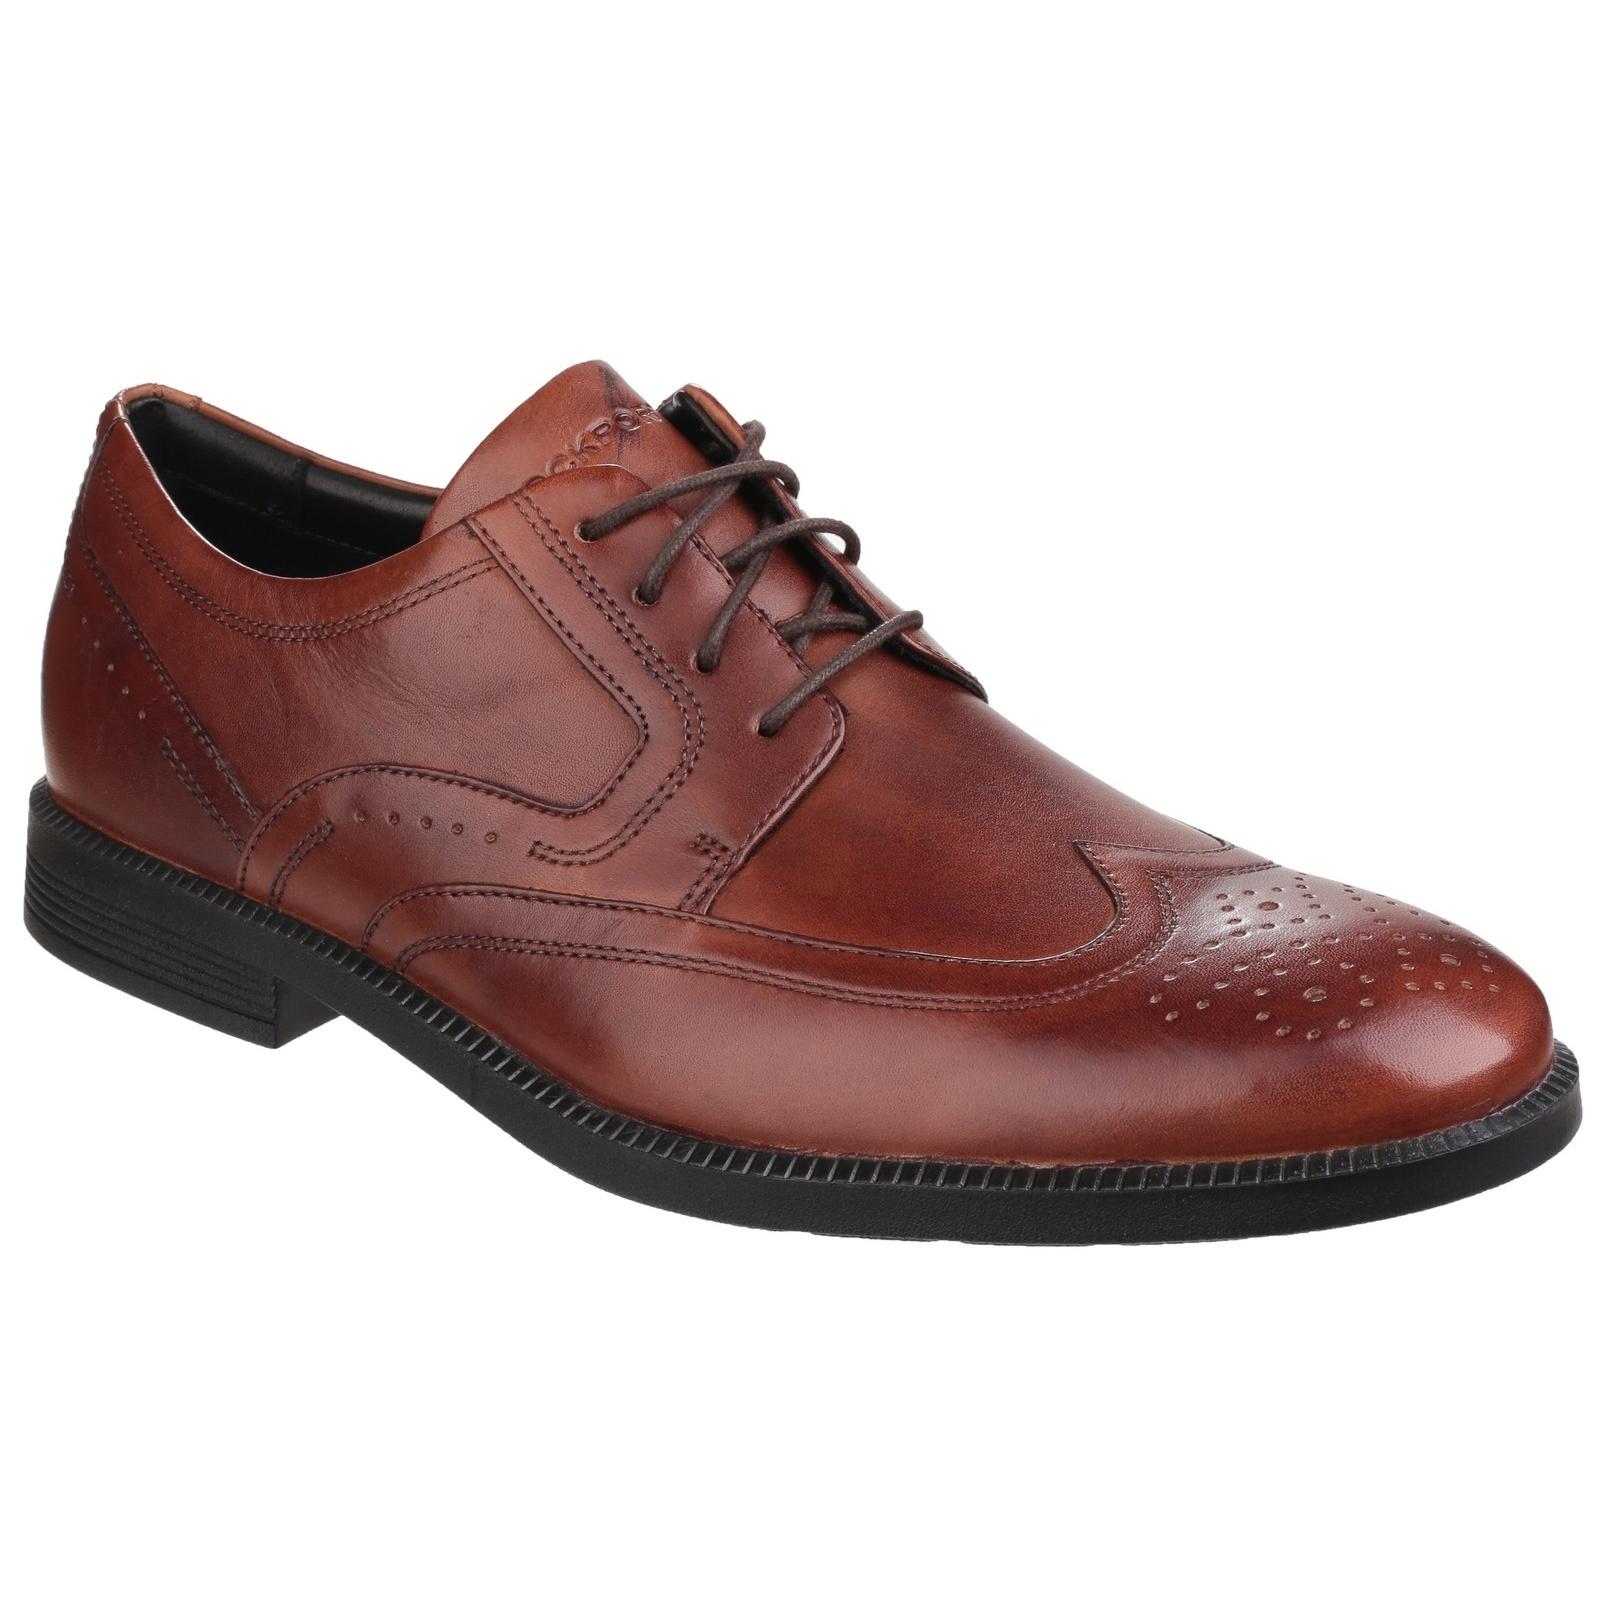 Rockport-Herren-Dressport-Modern-Wing-Perforation-Schuhe